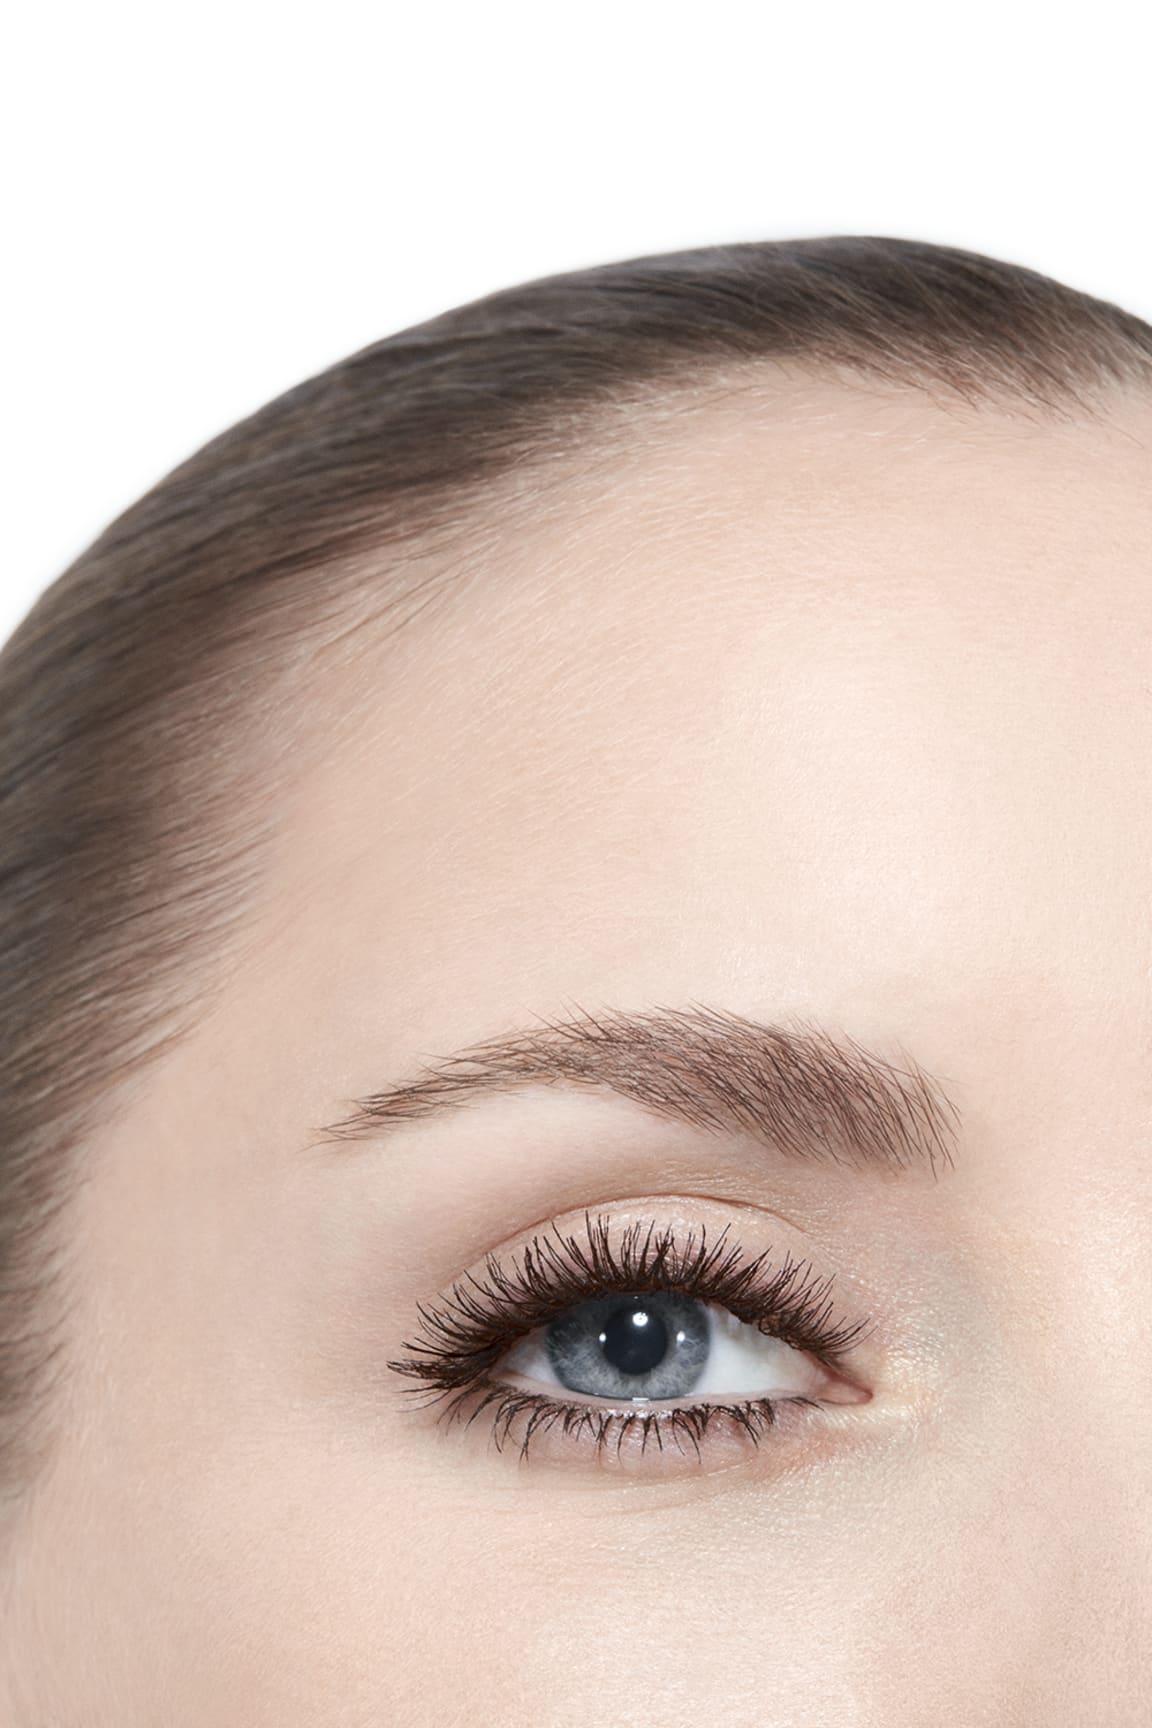 Application makeup visual 3 - LE VOLUME DE CHANEL WATERPROOF 20 - BRUN